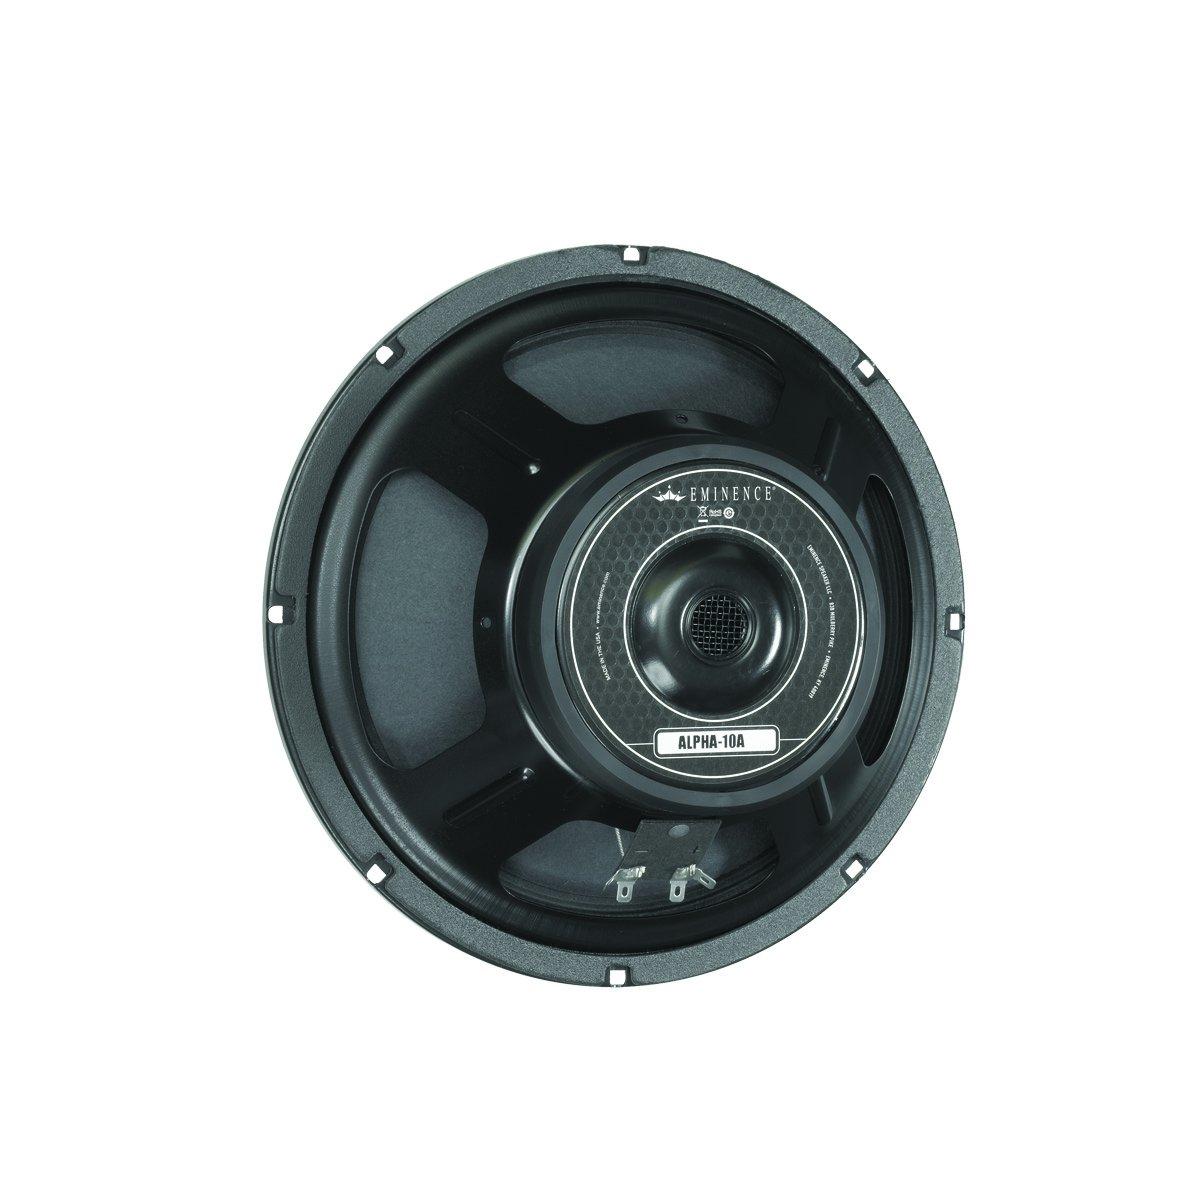 Eminence American Standard Alpha-10A 10'' Mid-Bass Pro Audio Speaker, 150 Watts at 8 Ohms